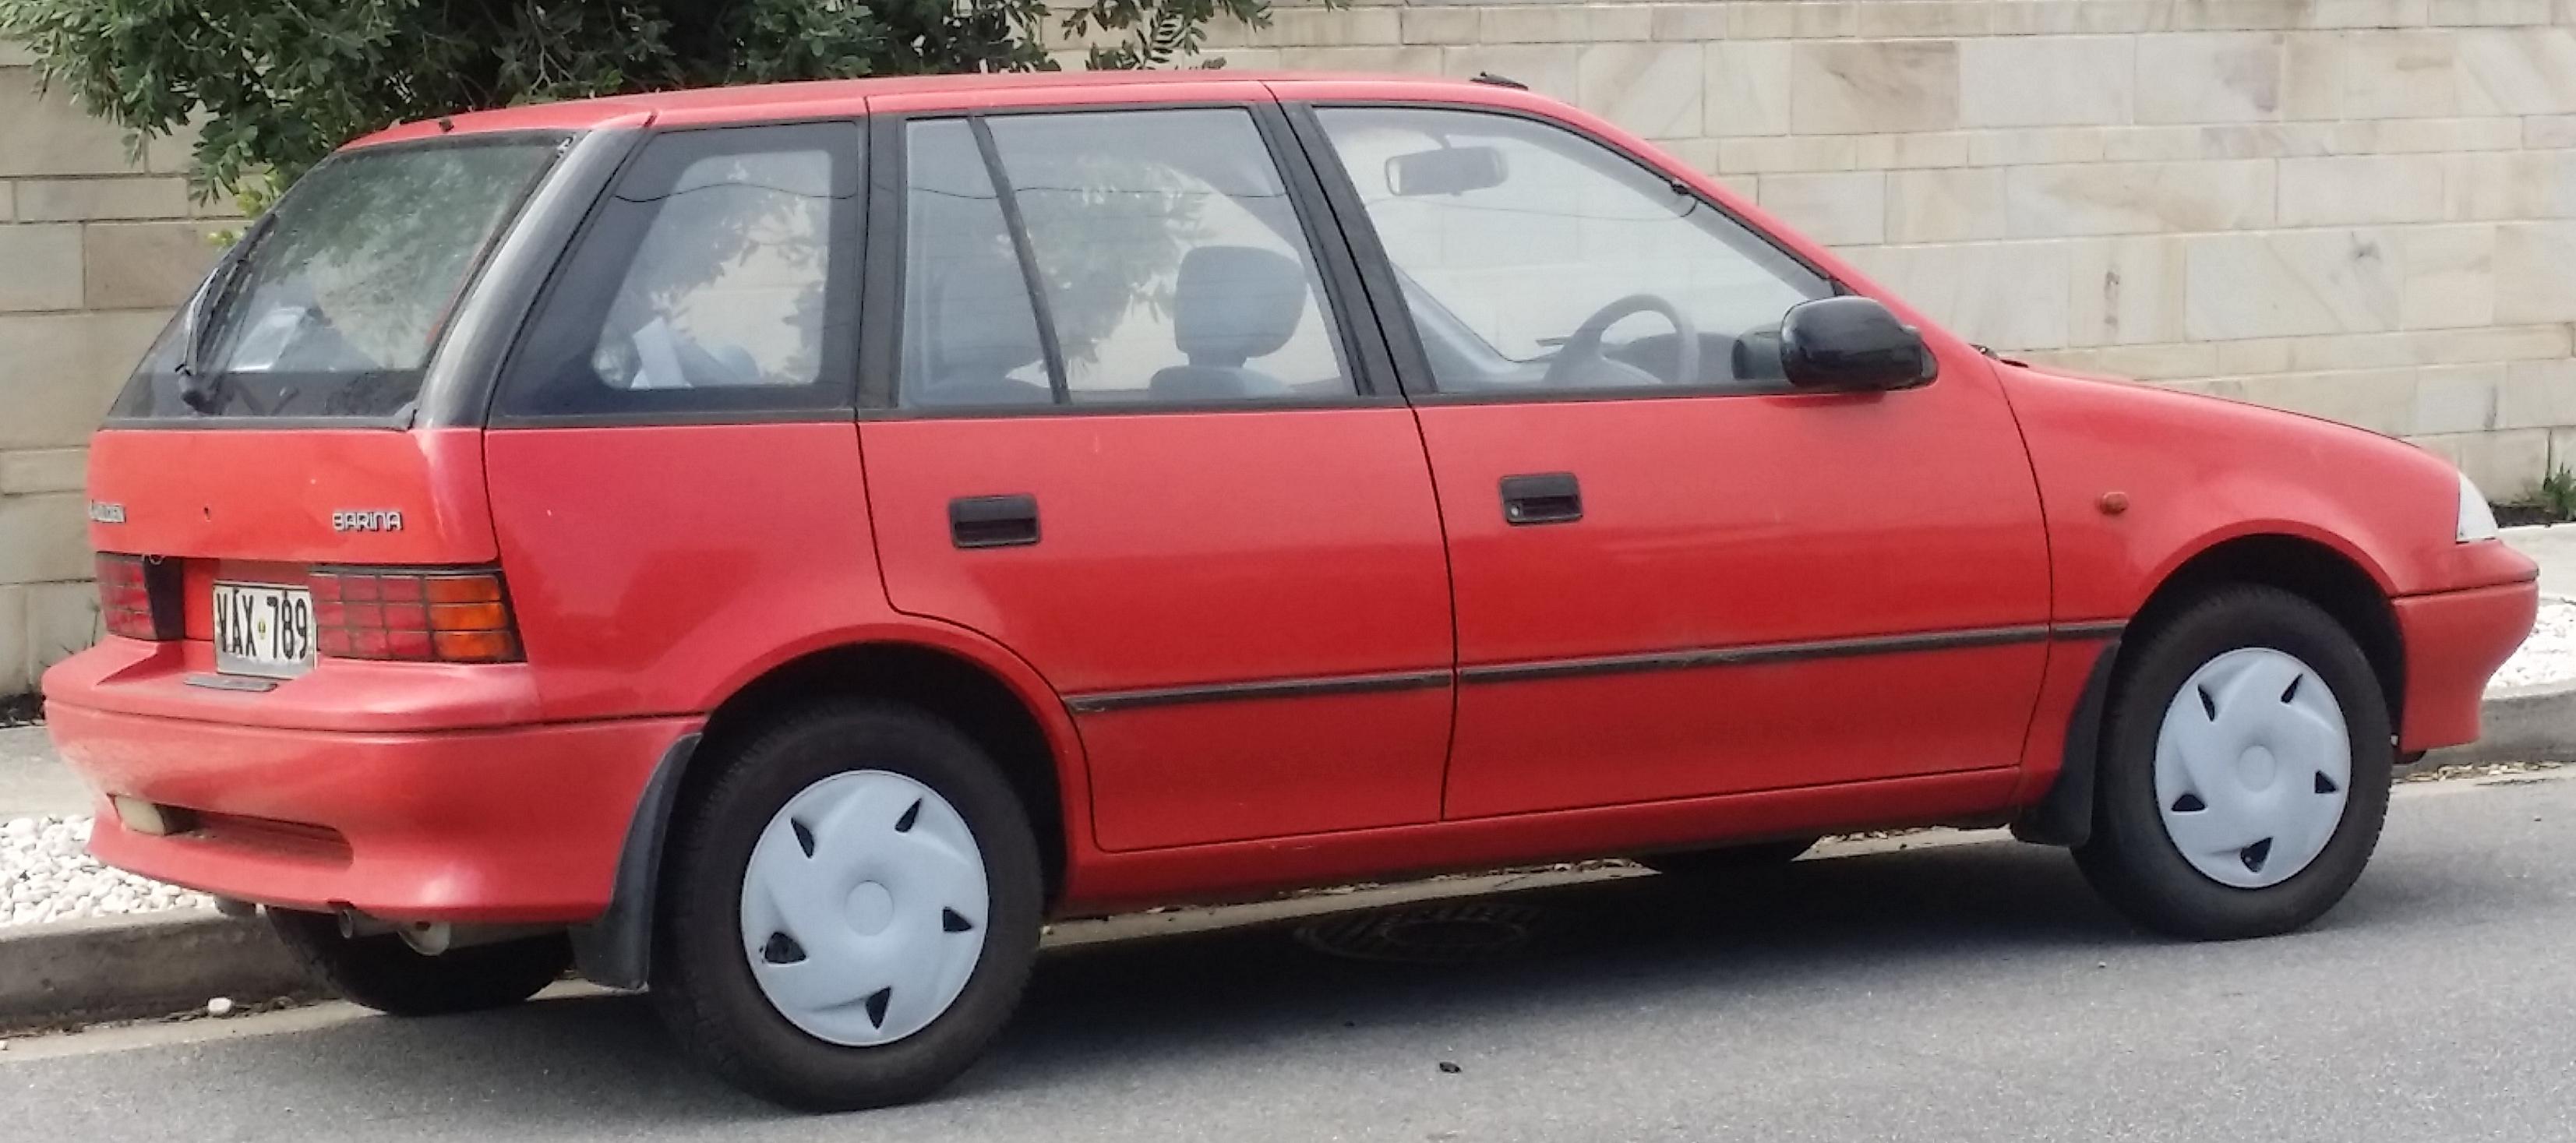 File19891991 Holden Barina MF 5door hatchback 16775386400